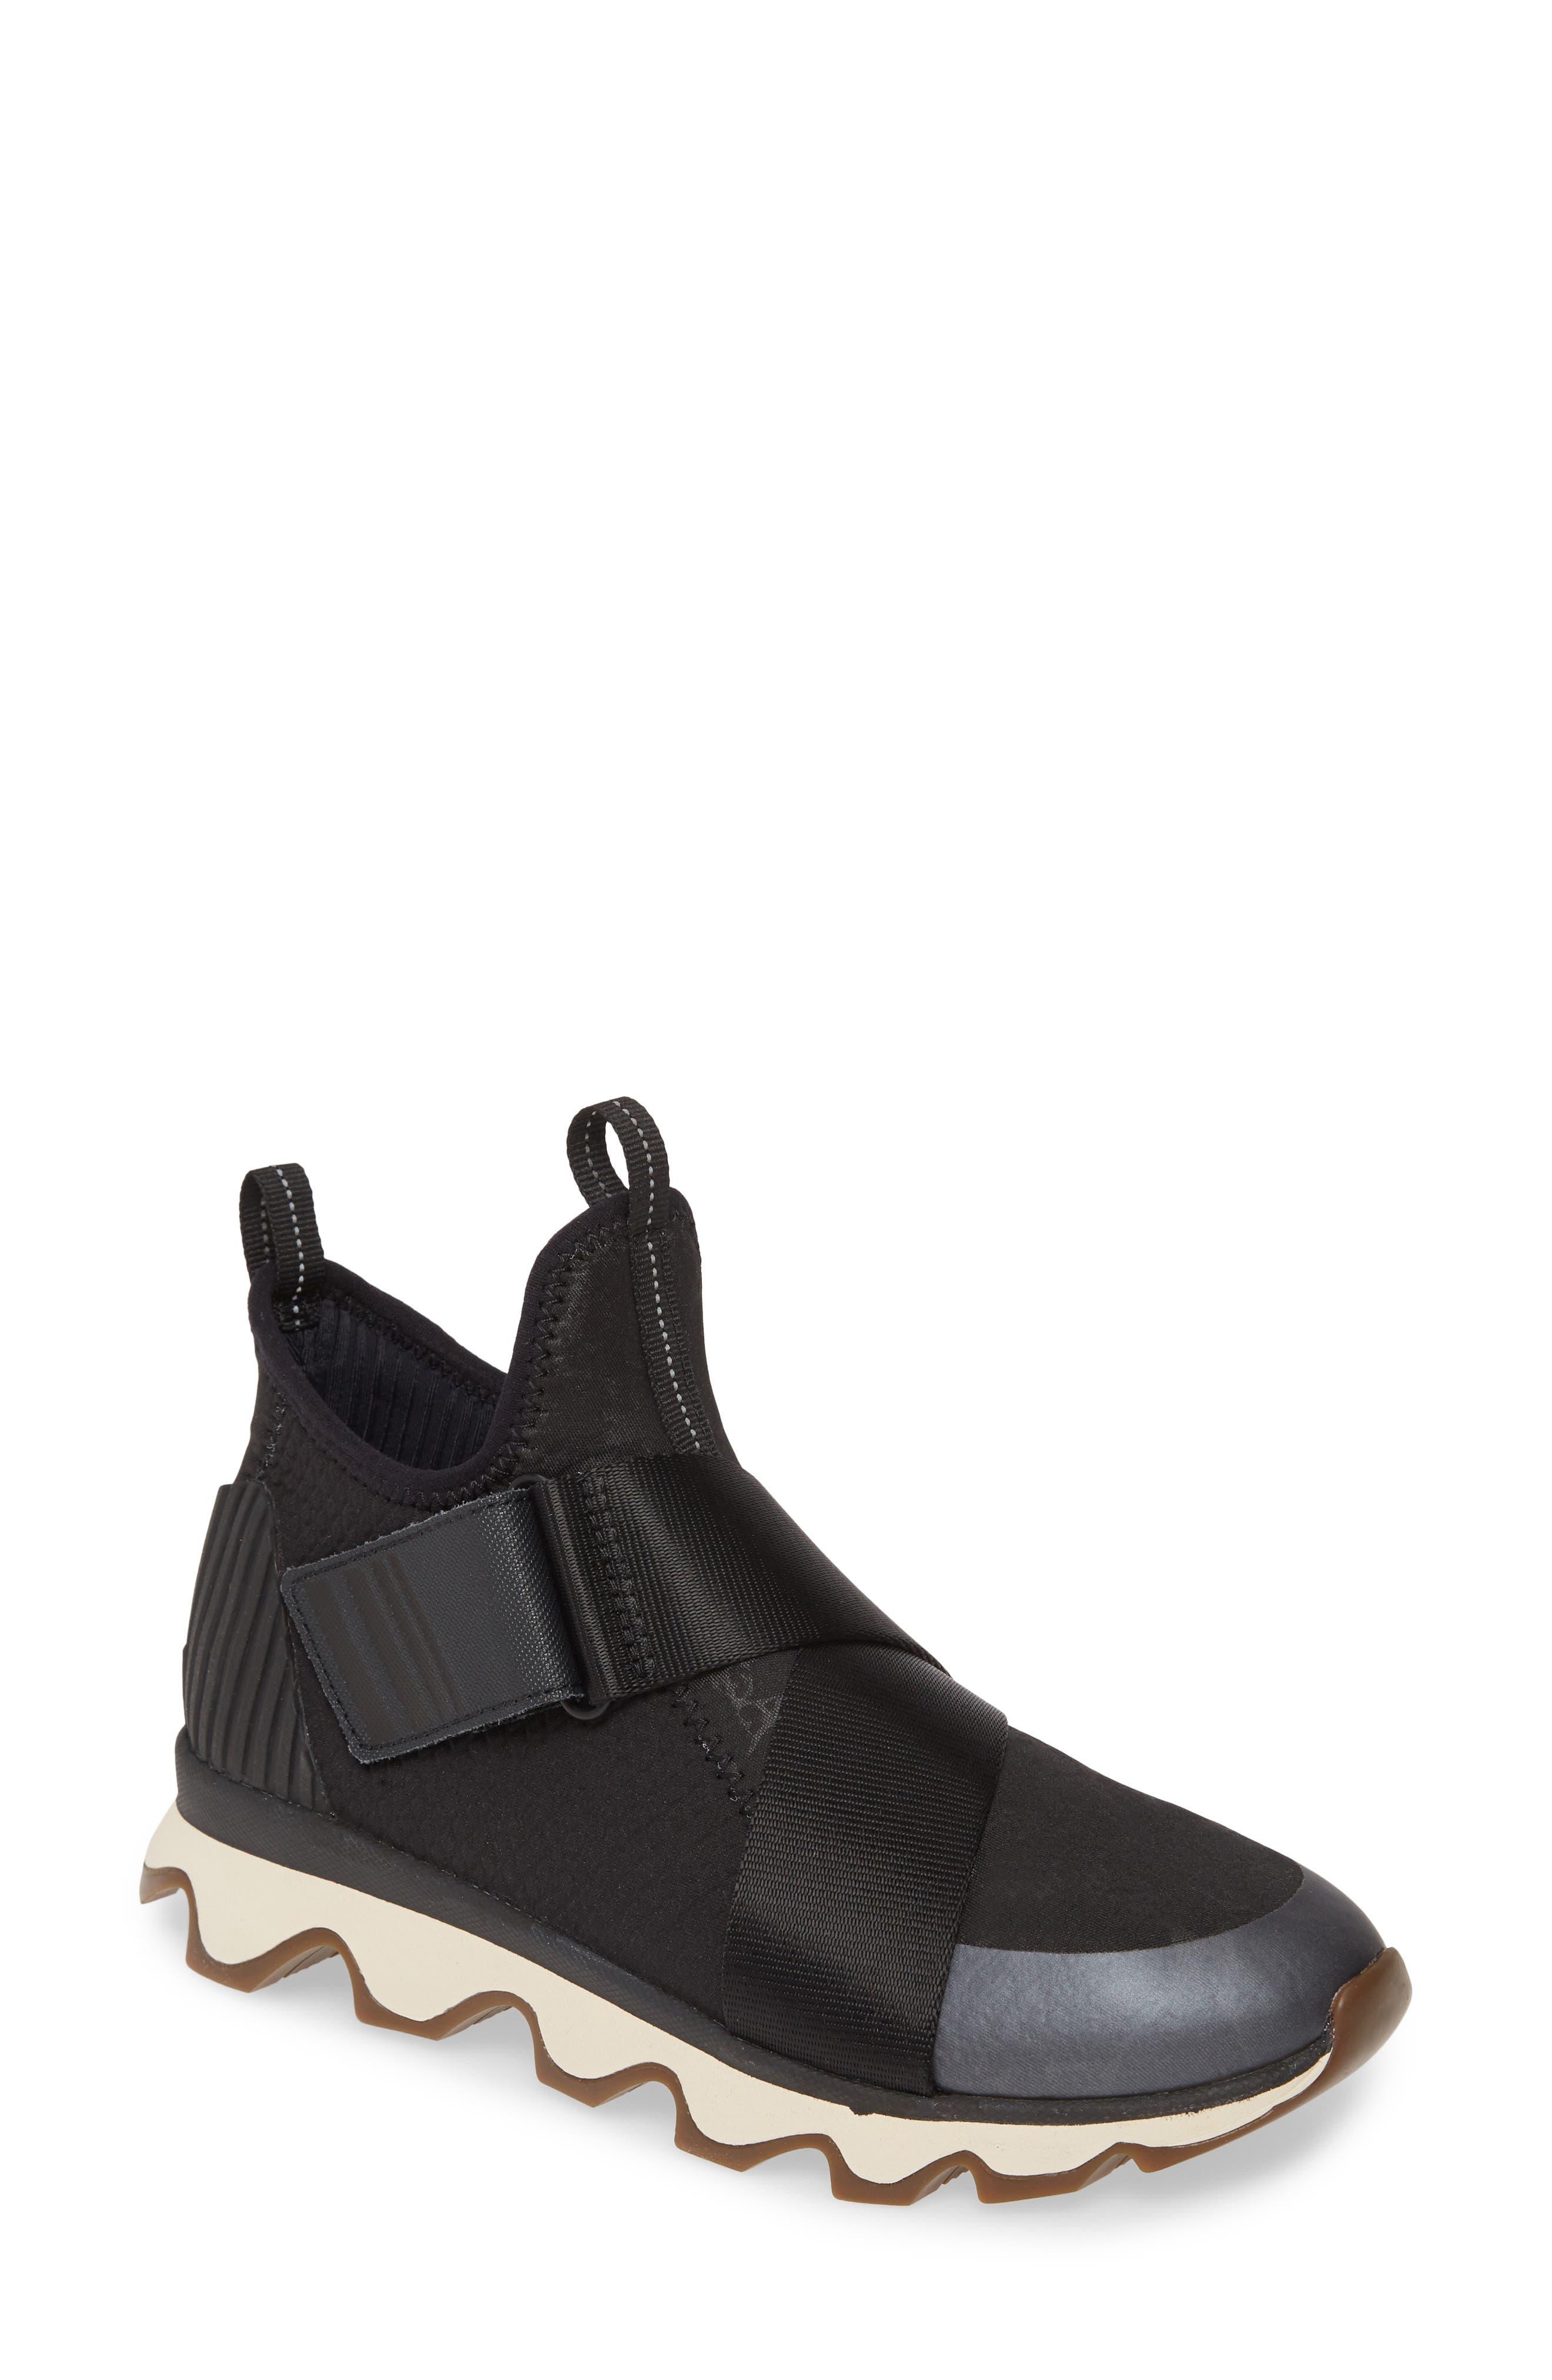 Image of Sorel Kinetic High Top Sneaker